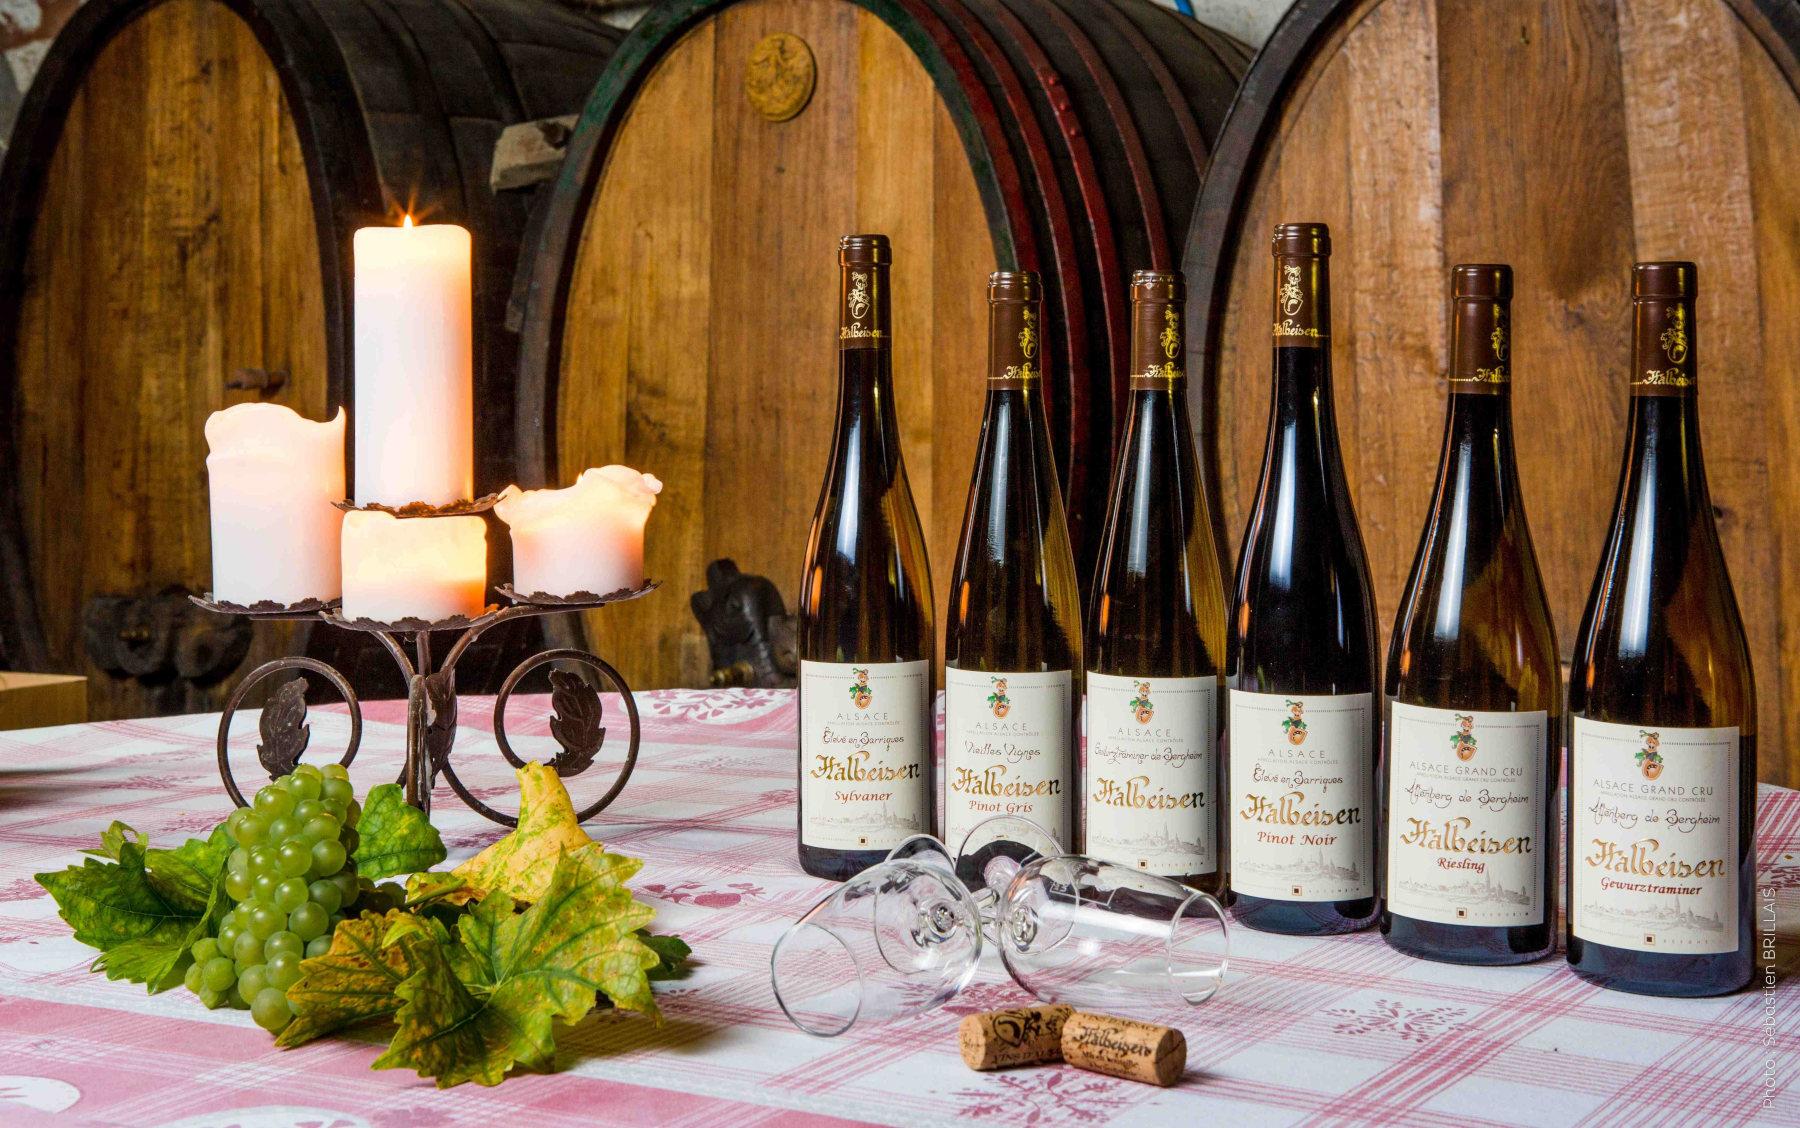 Vins et Cr�mant d'Alsace HALBEISEN